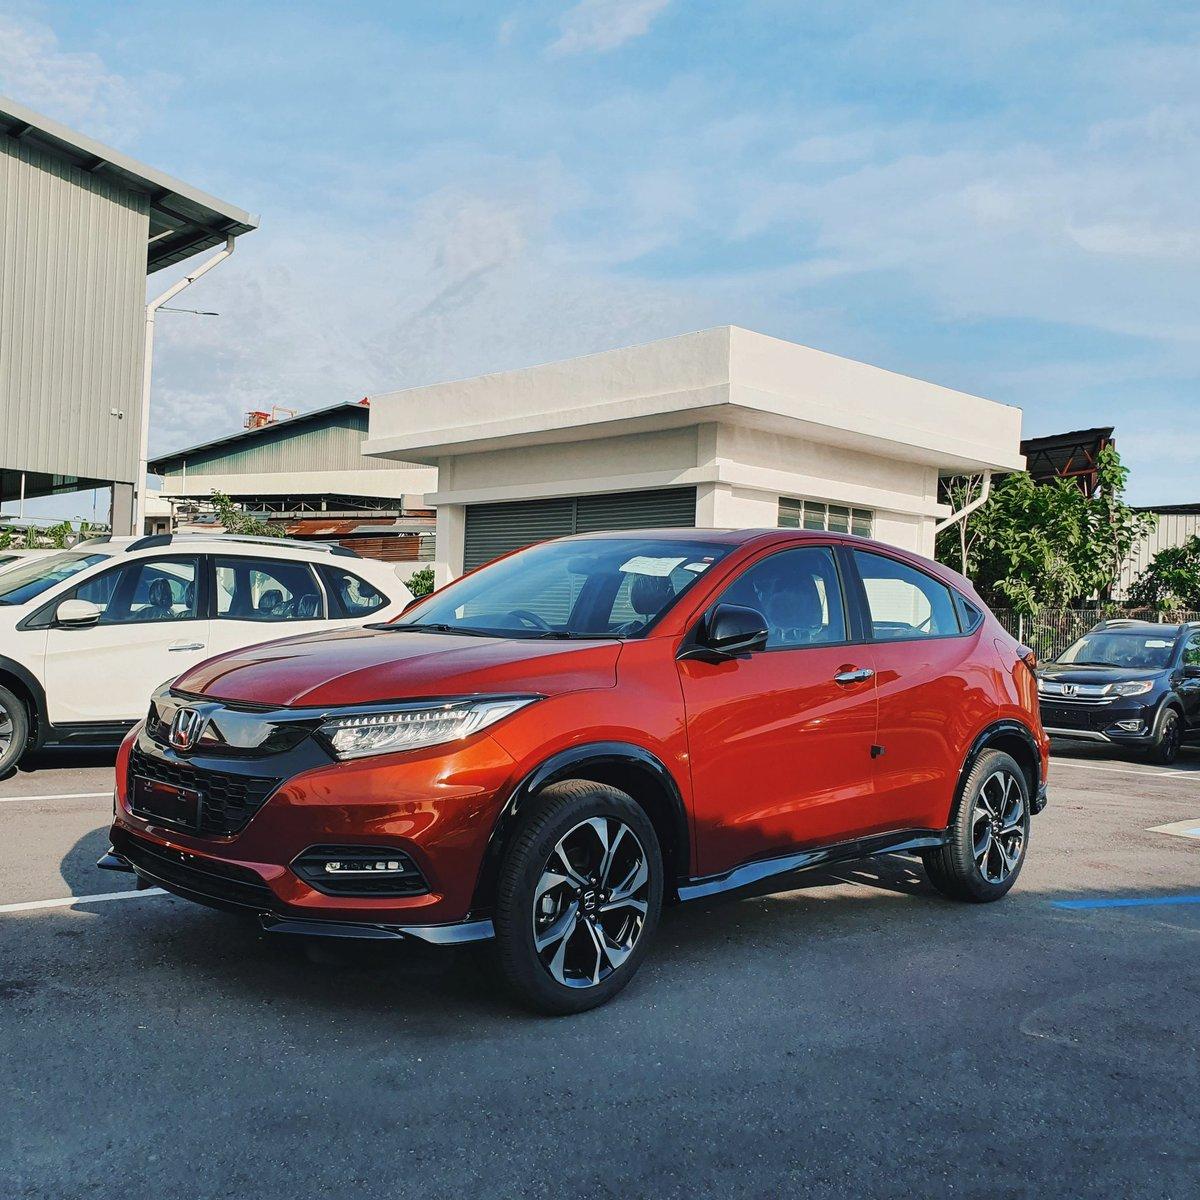 Kelebihan Kekurangan Harga Mobil Honda Hrv Murah Berkualitas